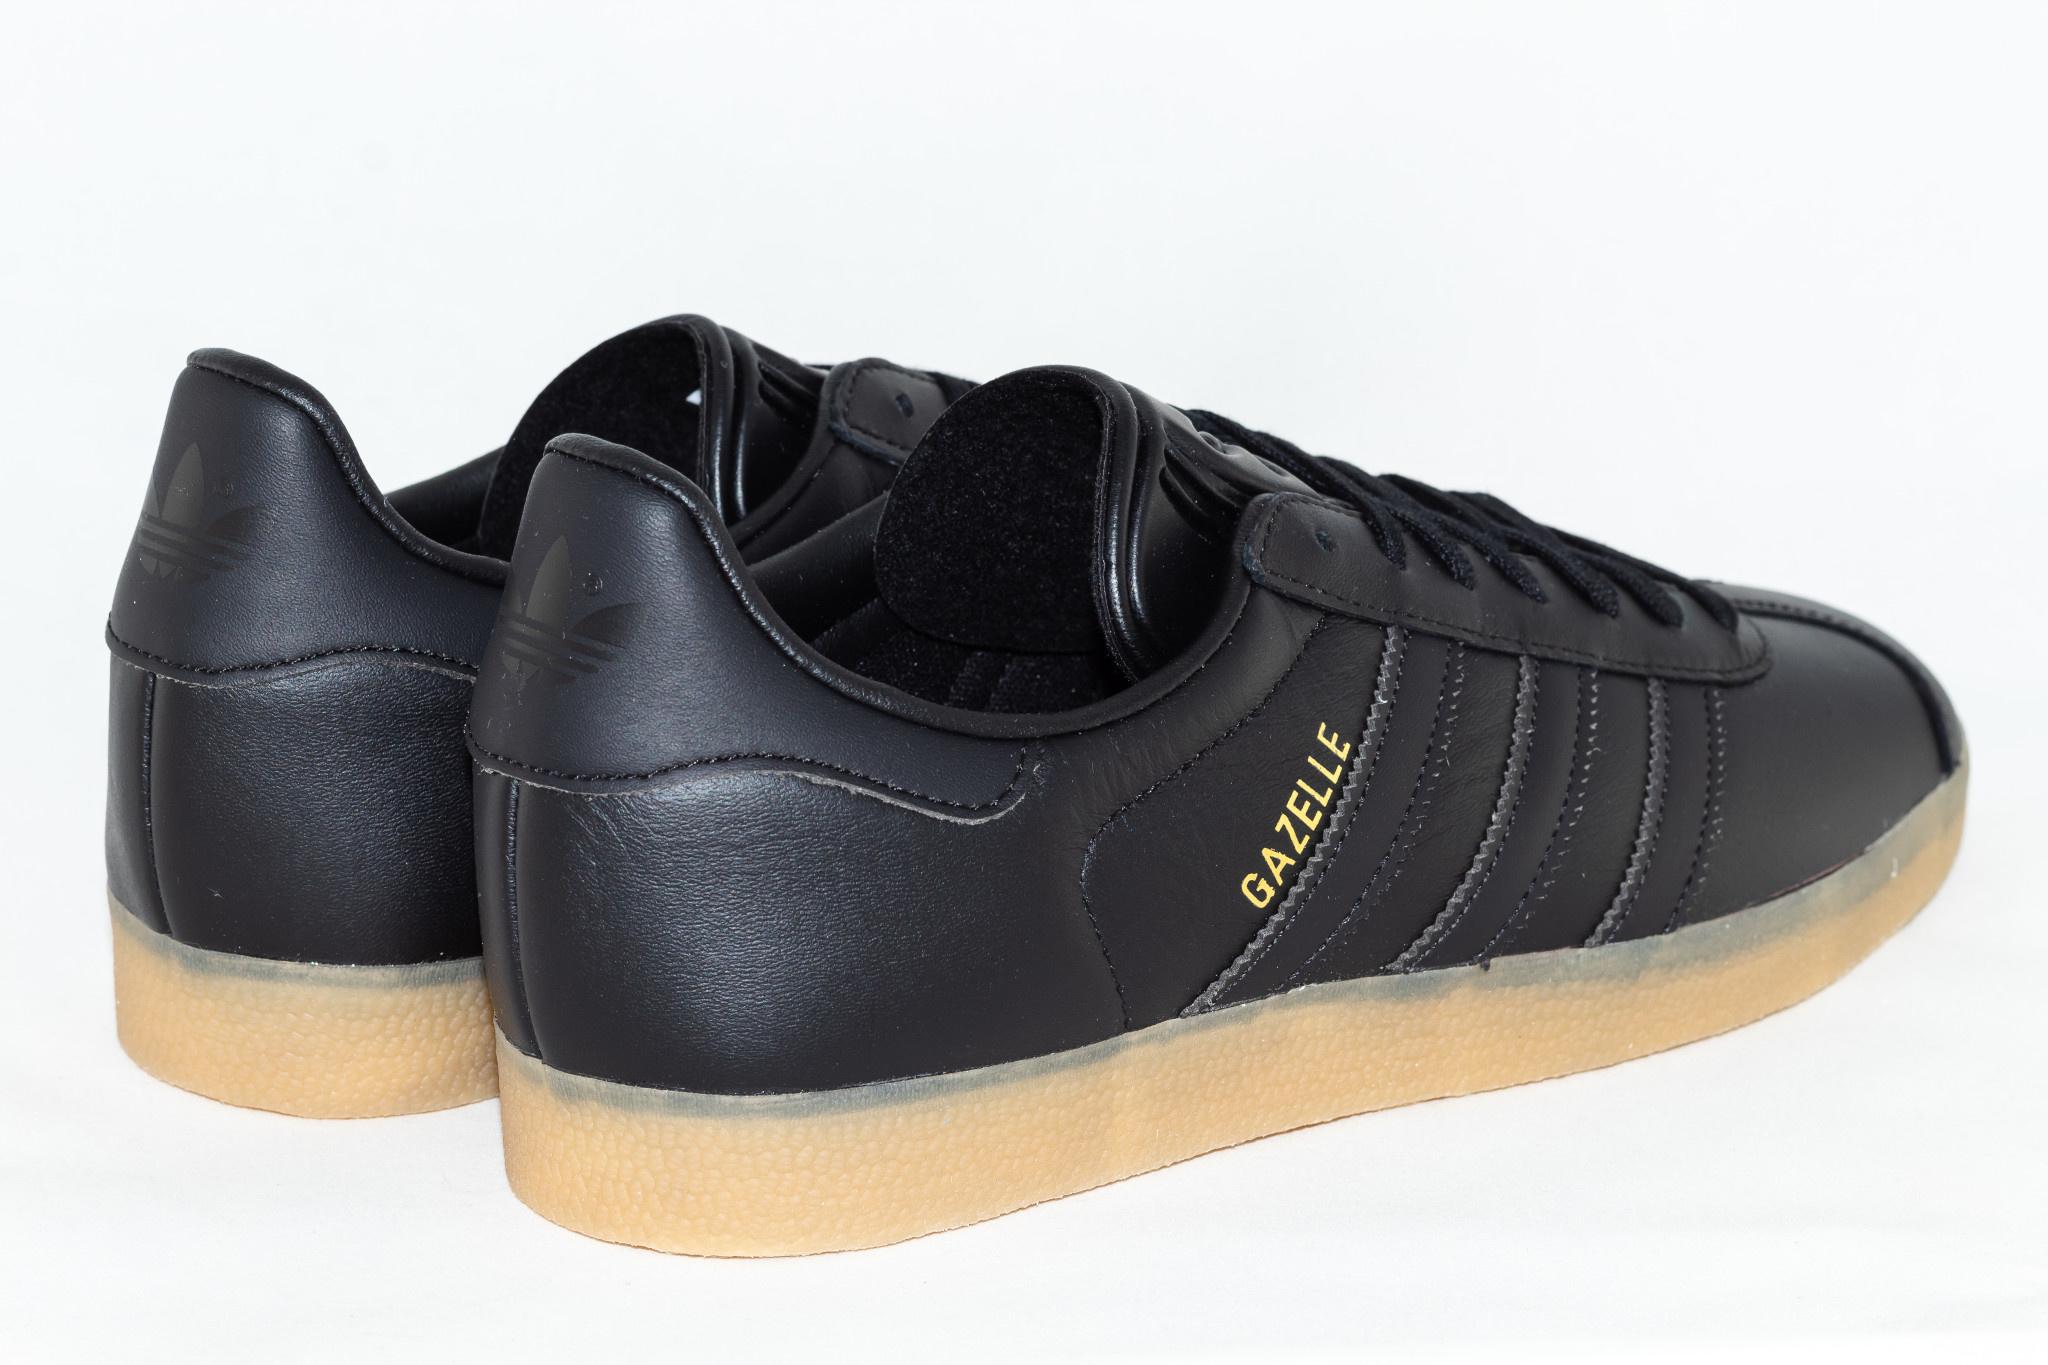 Adidas ADIDAS GAZELLE Cblack/ Cblack/ Gum3